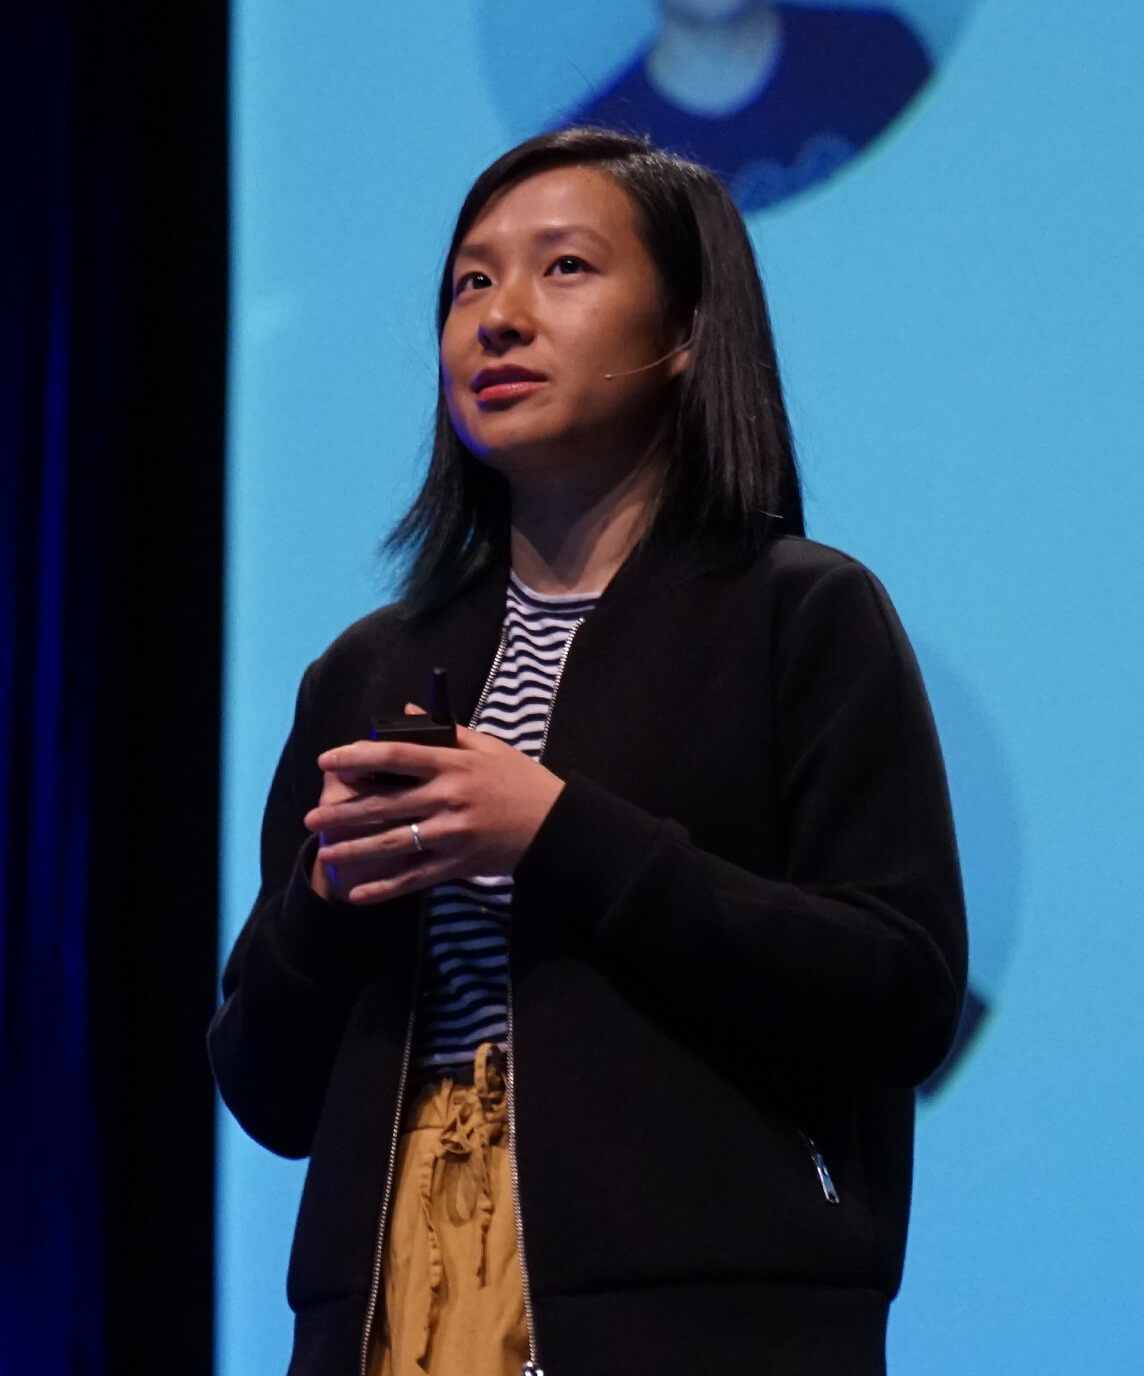 Lisa Ding